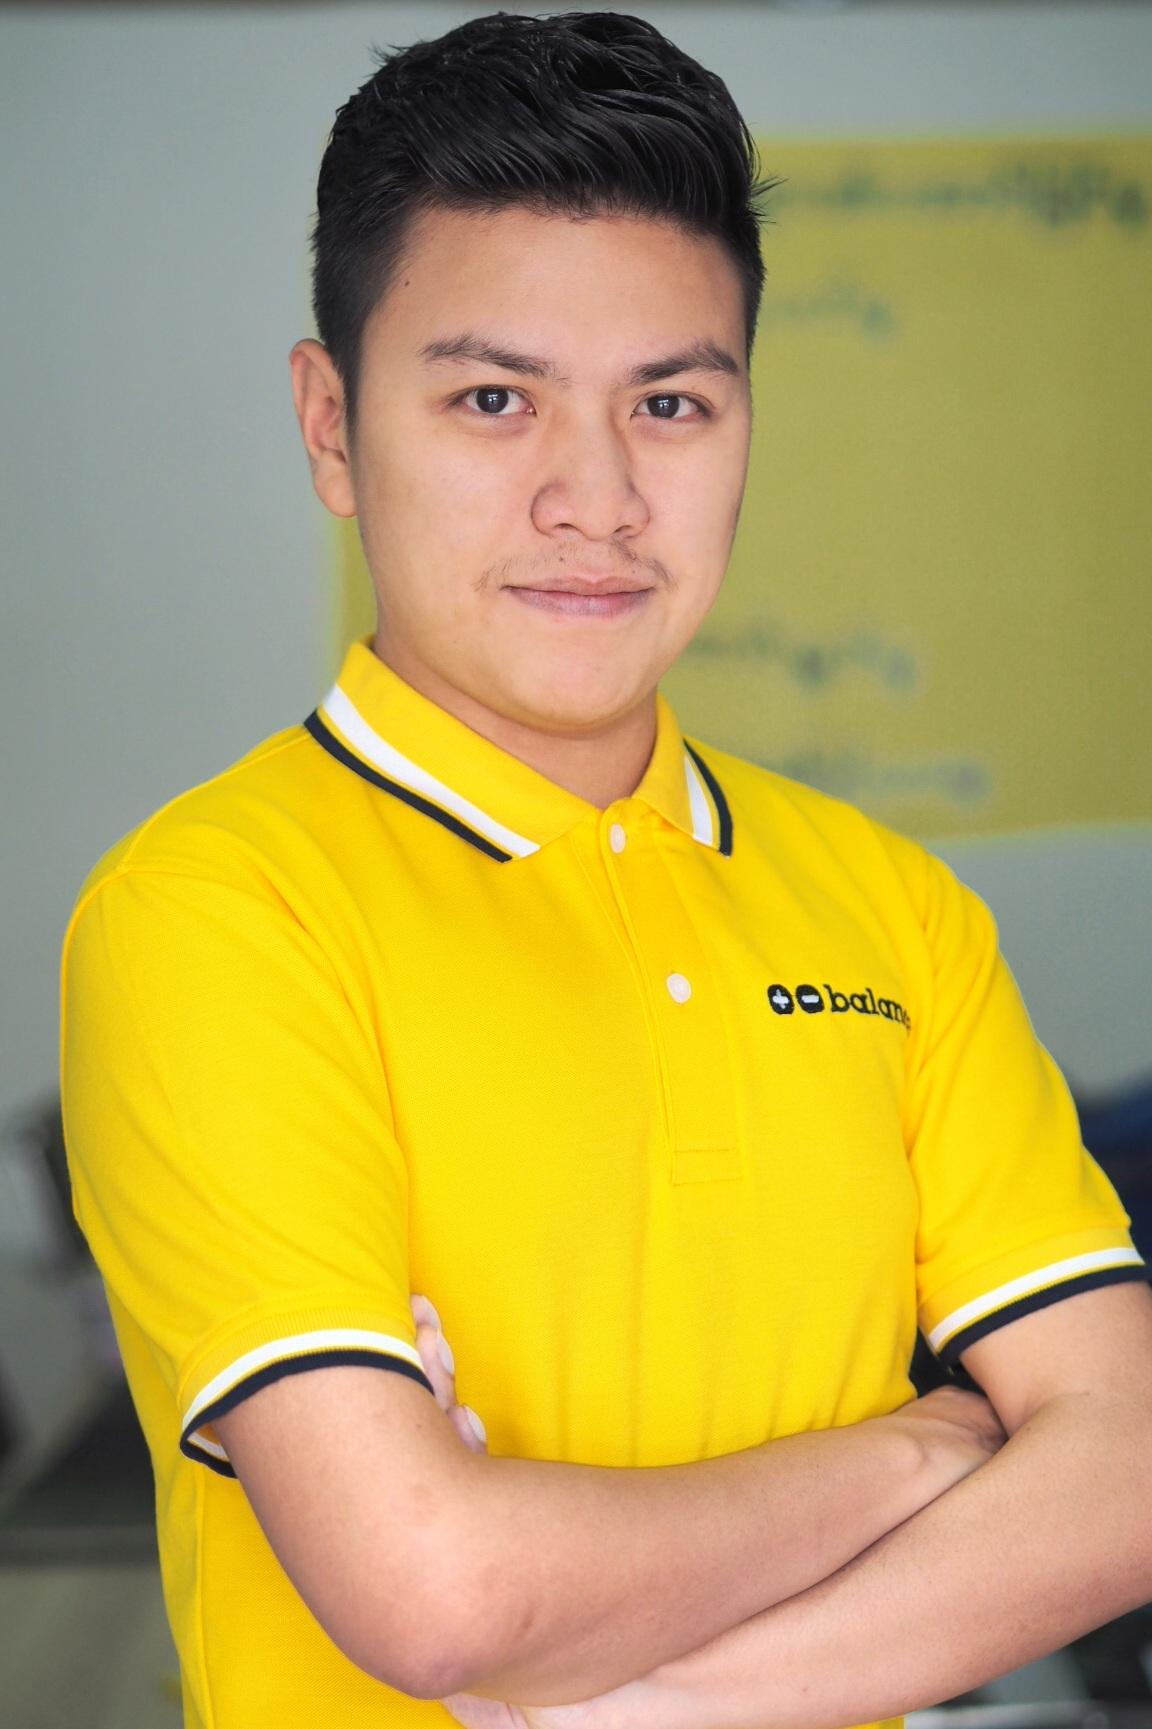 Thi Han Hla Soe - Legal Assistant